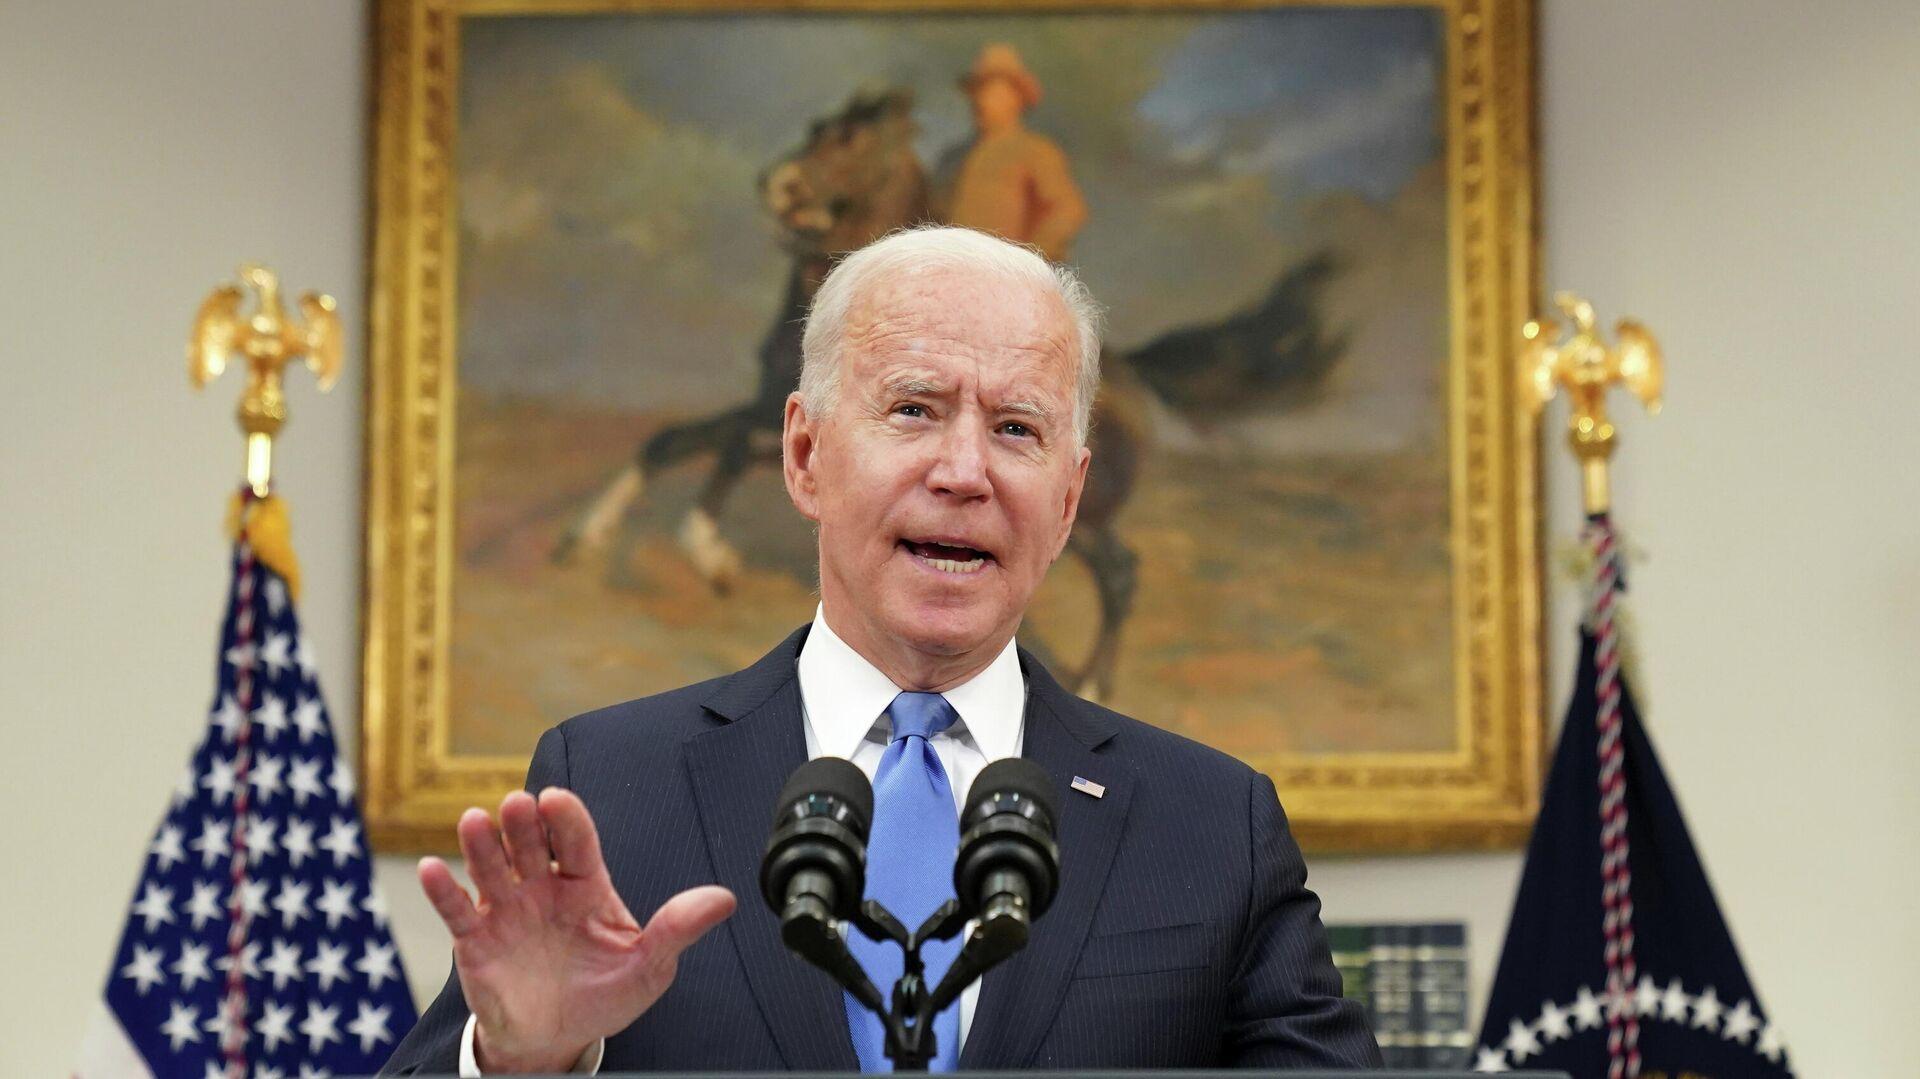 El presidente de Estados Unidos, Joe Biden - Sputnik Mundo, 1920, 11.06.2021